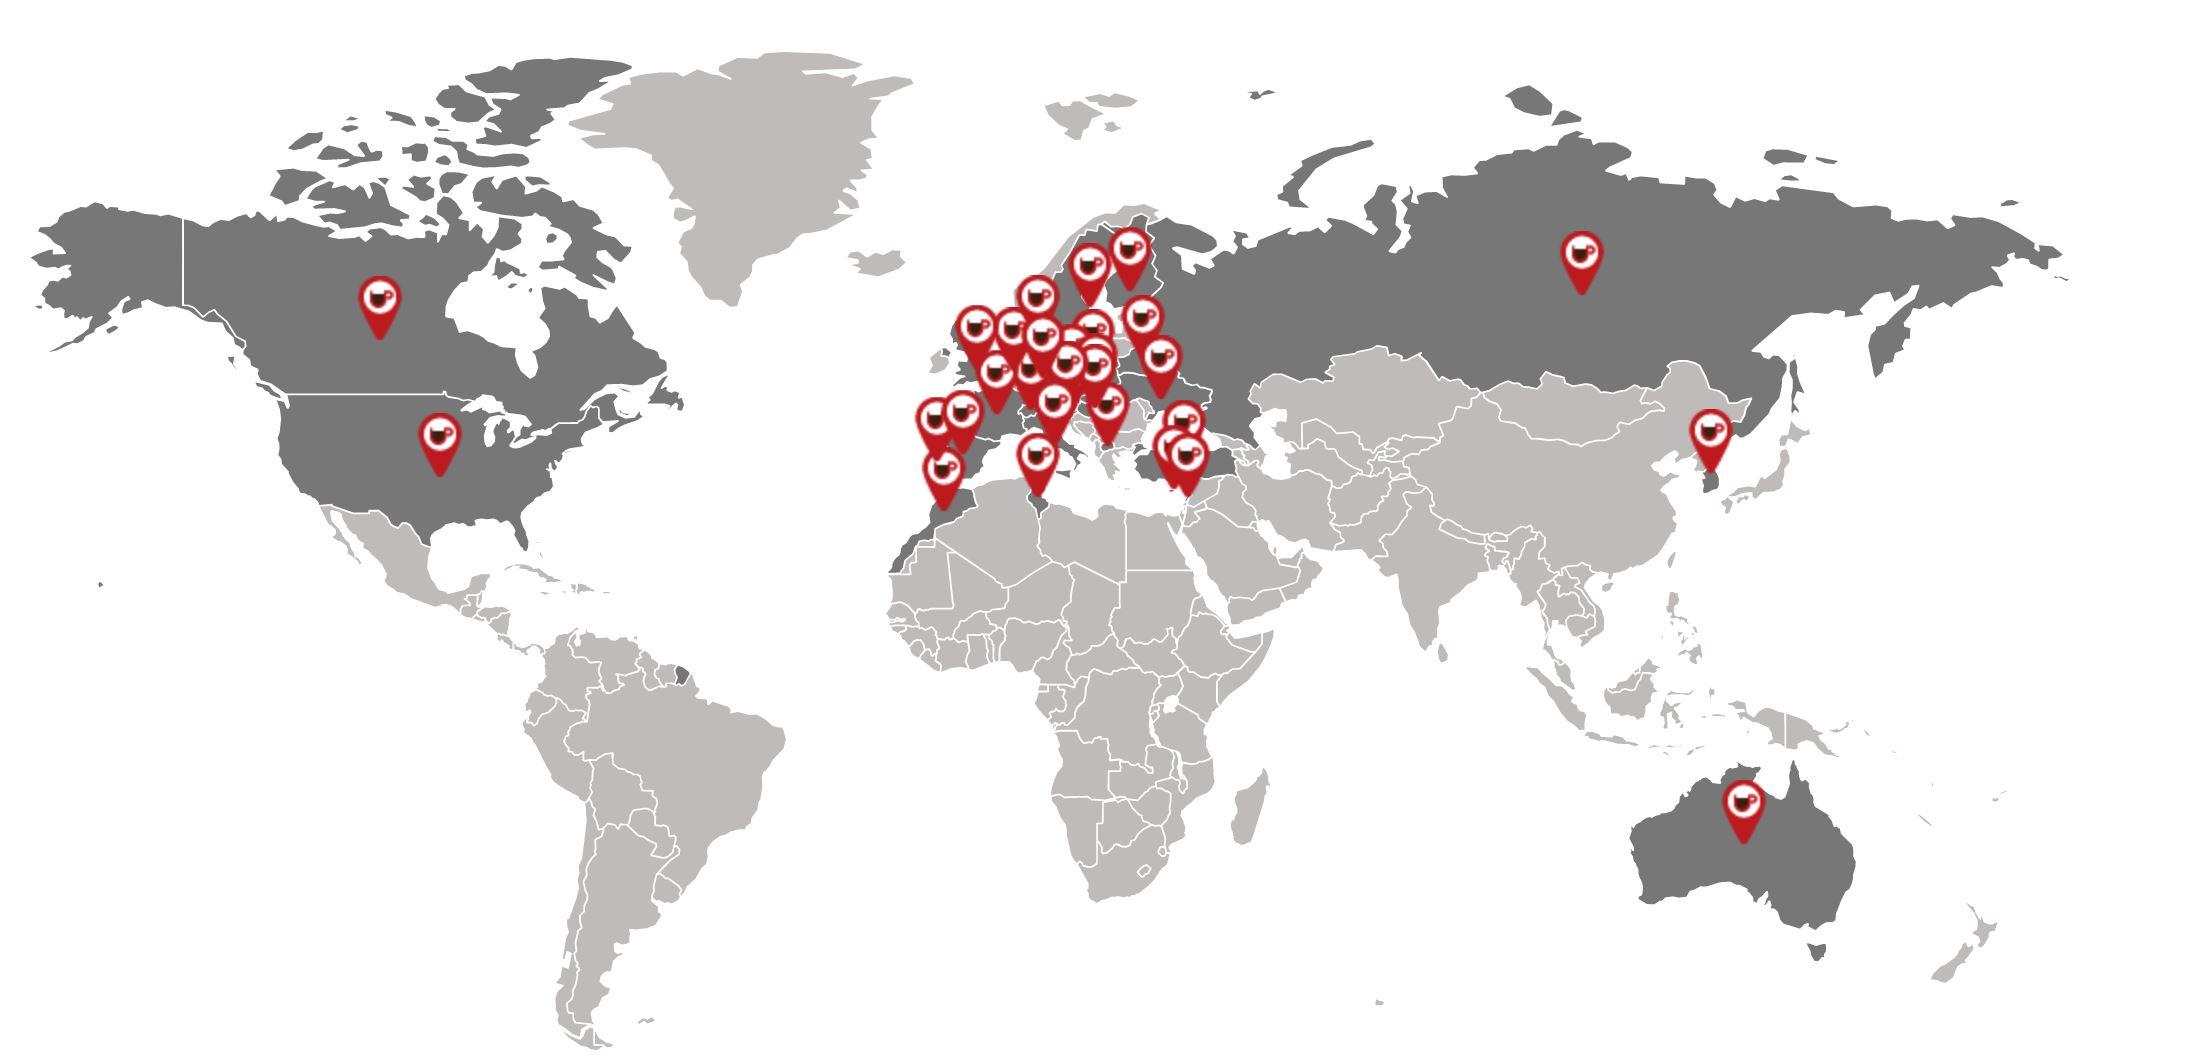 Ionia-Caffe-Weltkarte-ExportregionenwhBbsA5By8Sky